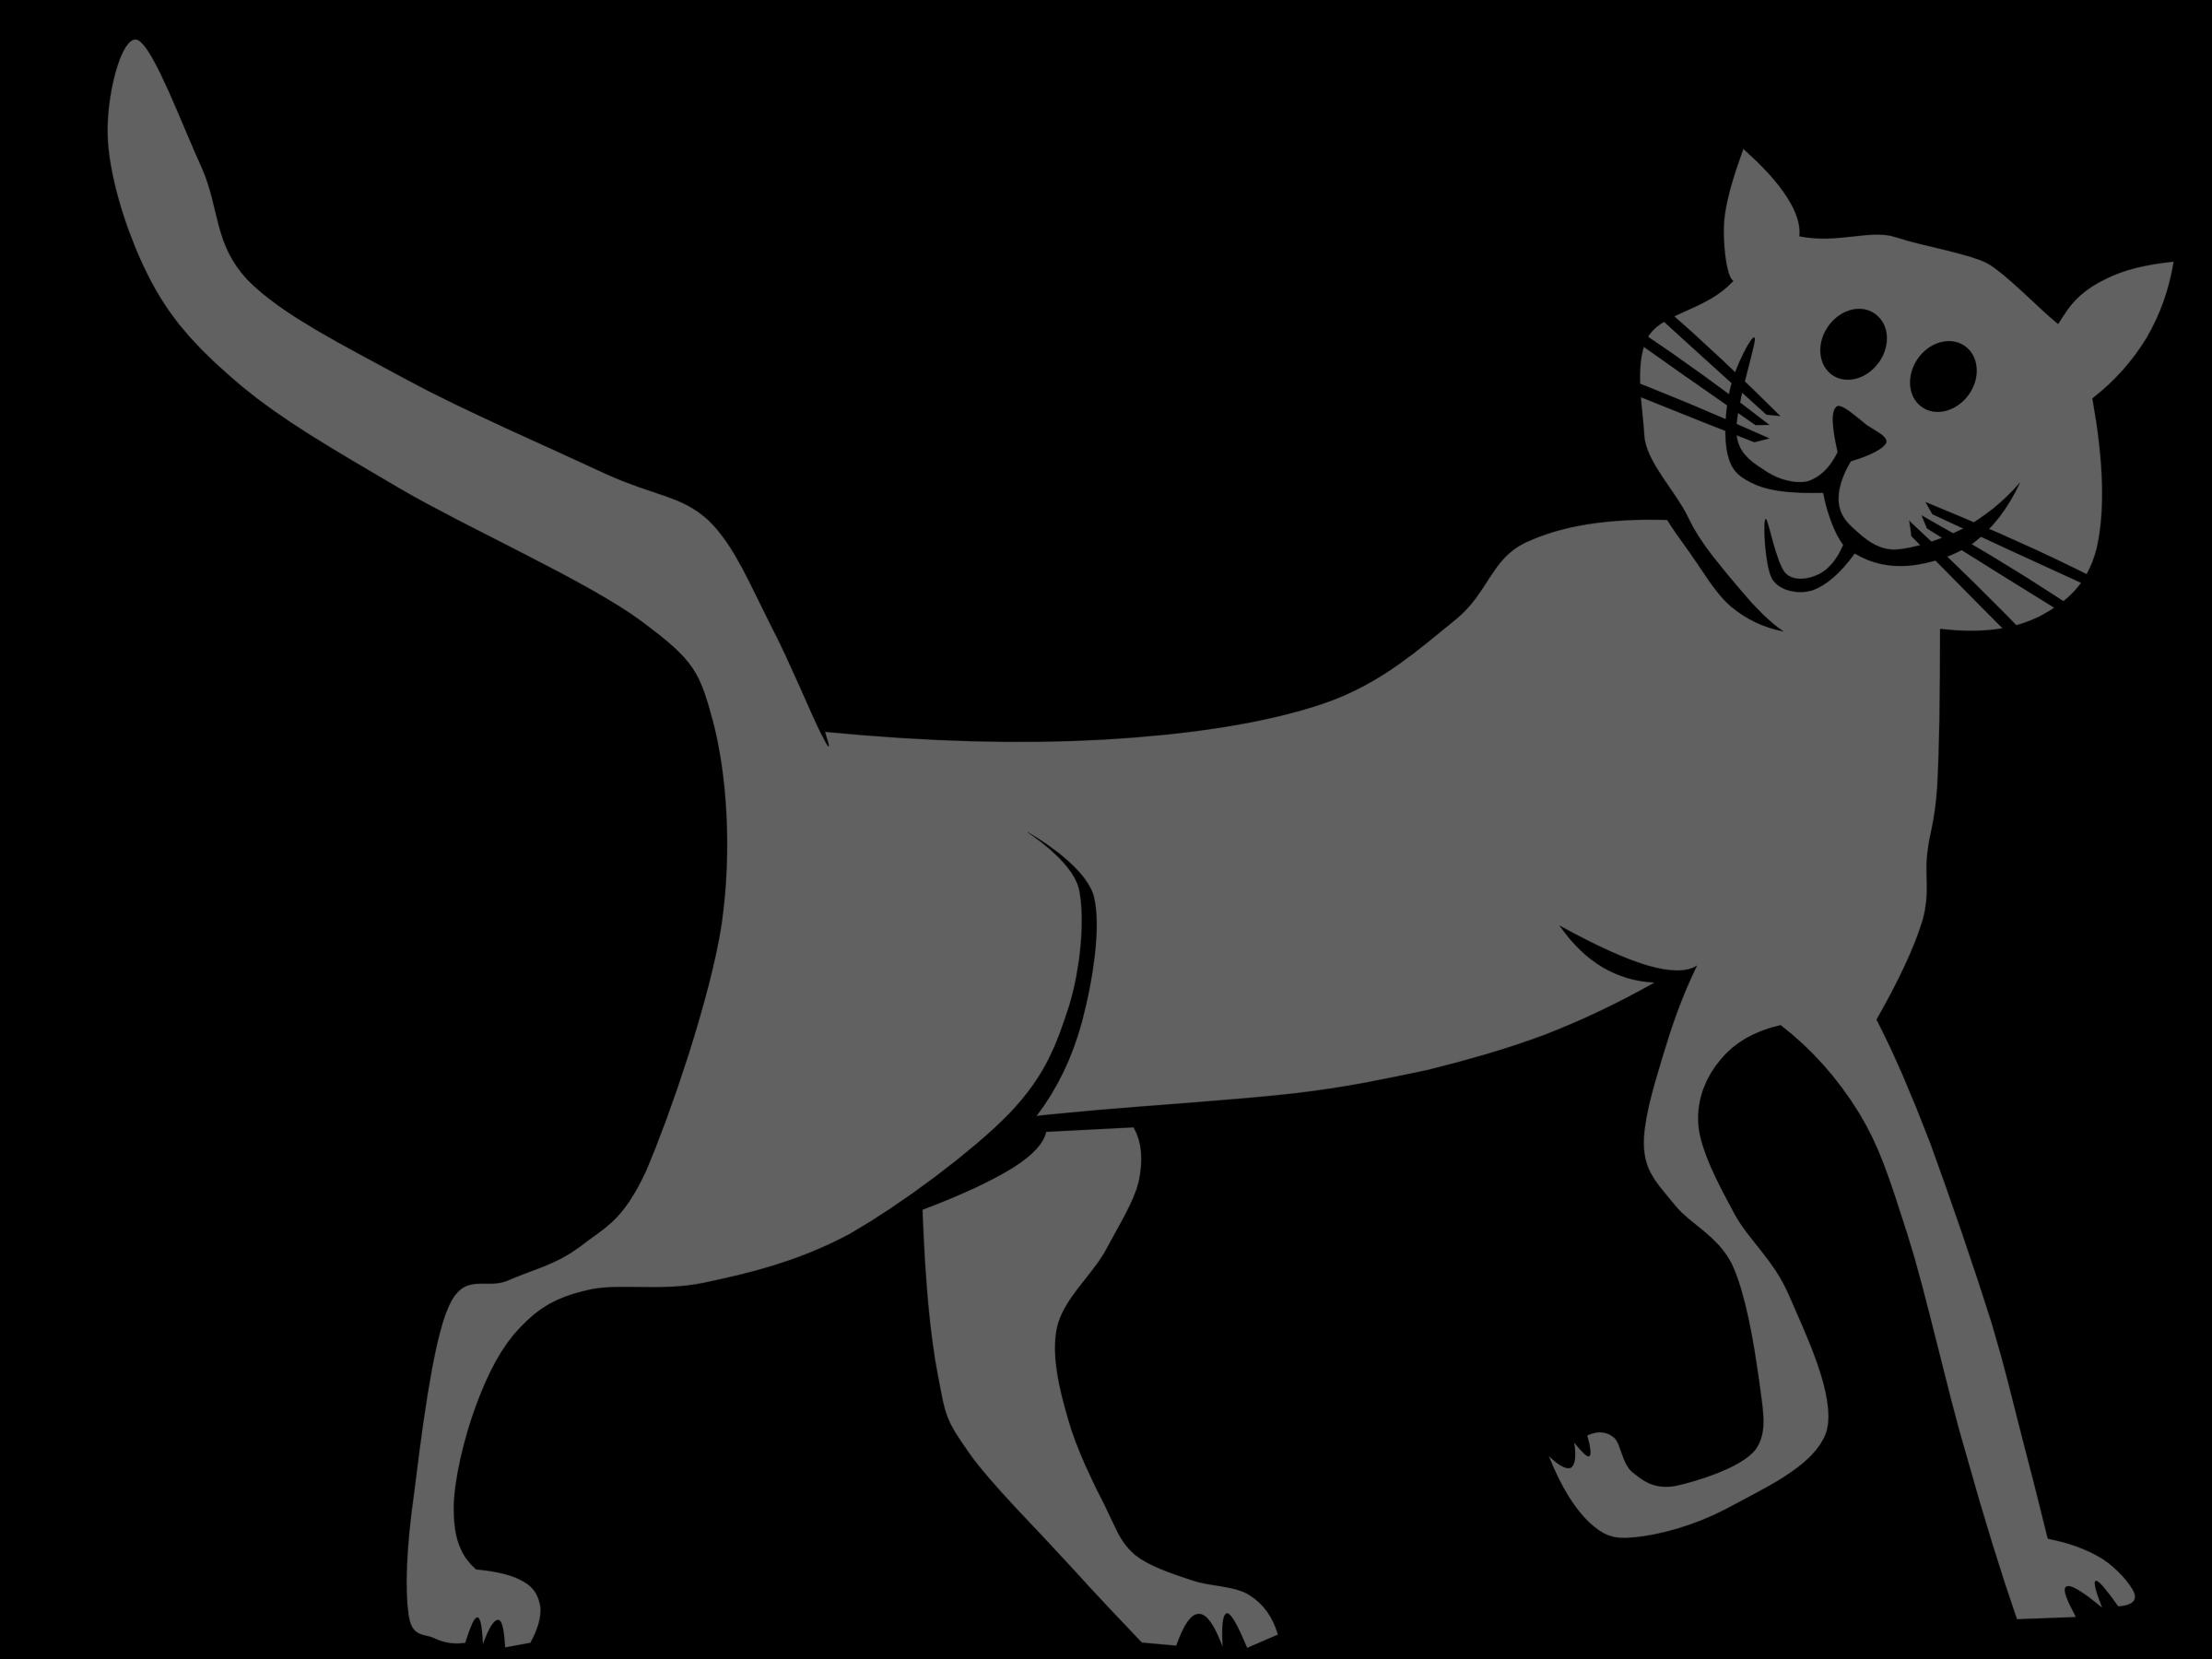 Clipart cat tail svg transparent stock Clipart - Cartoon Cat svg transparent stock